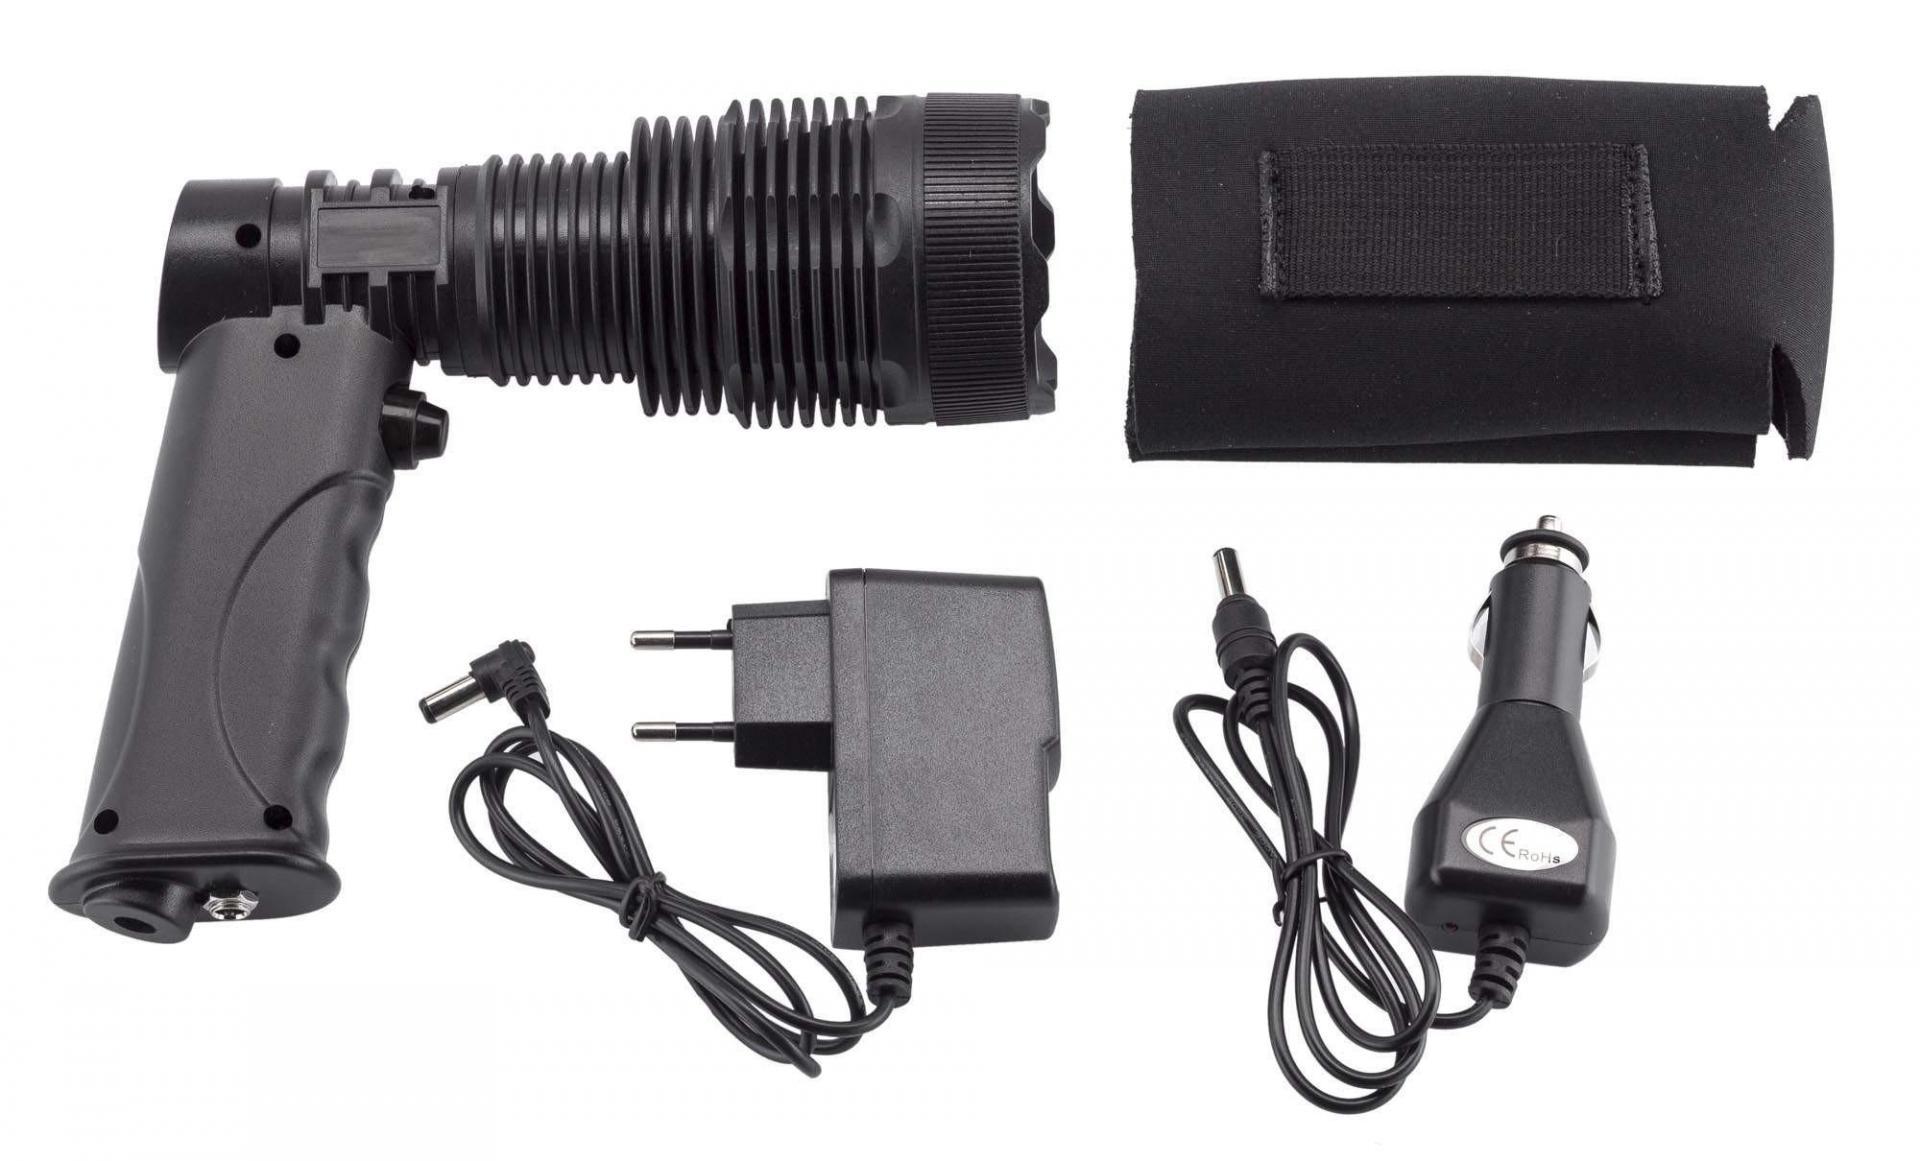 Lampe portative a led rechargeable